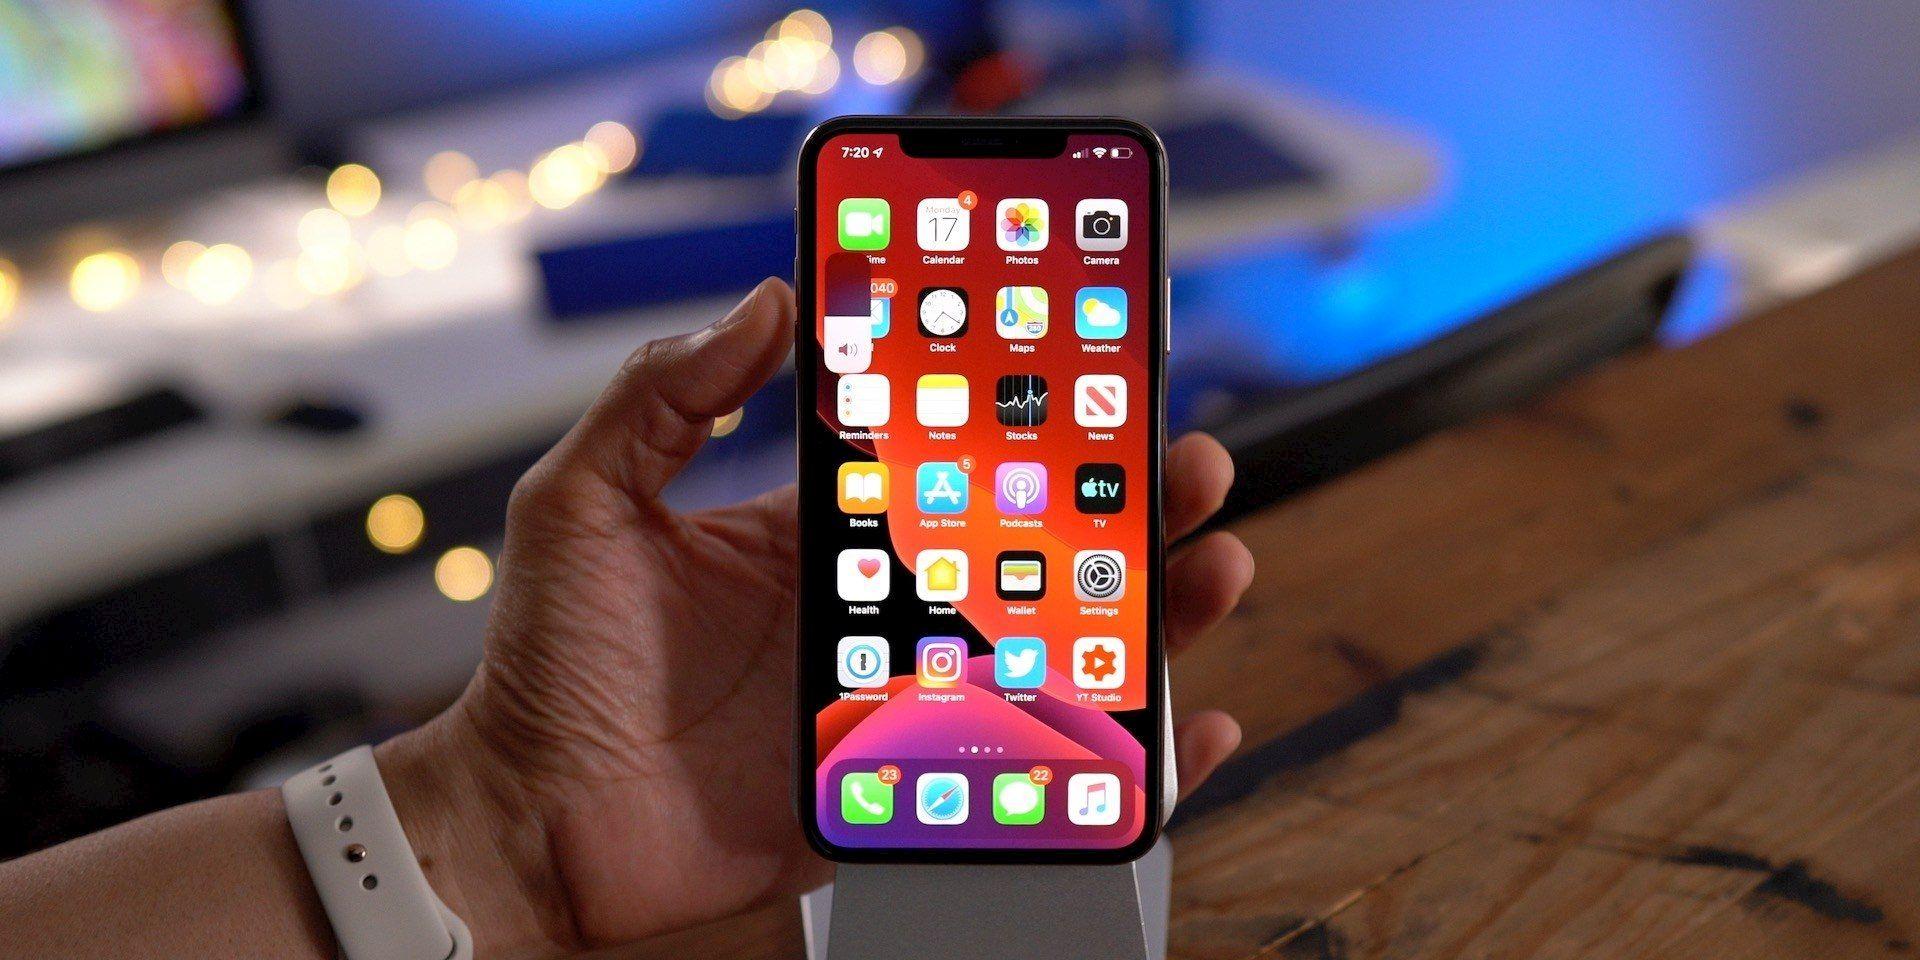 Tham khảo https//didongthongminh.vn/iphone Iphone, Ios